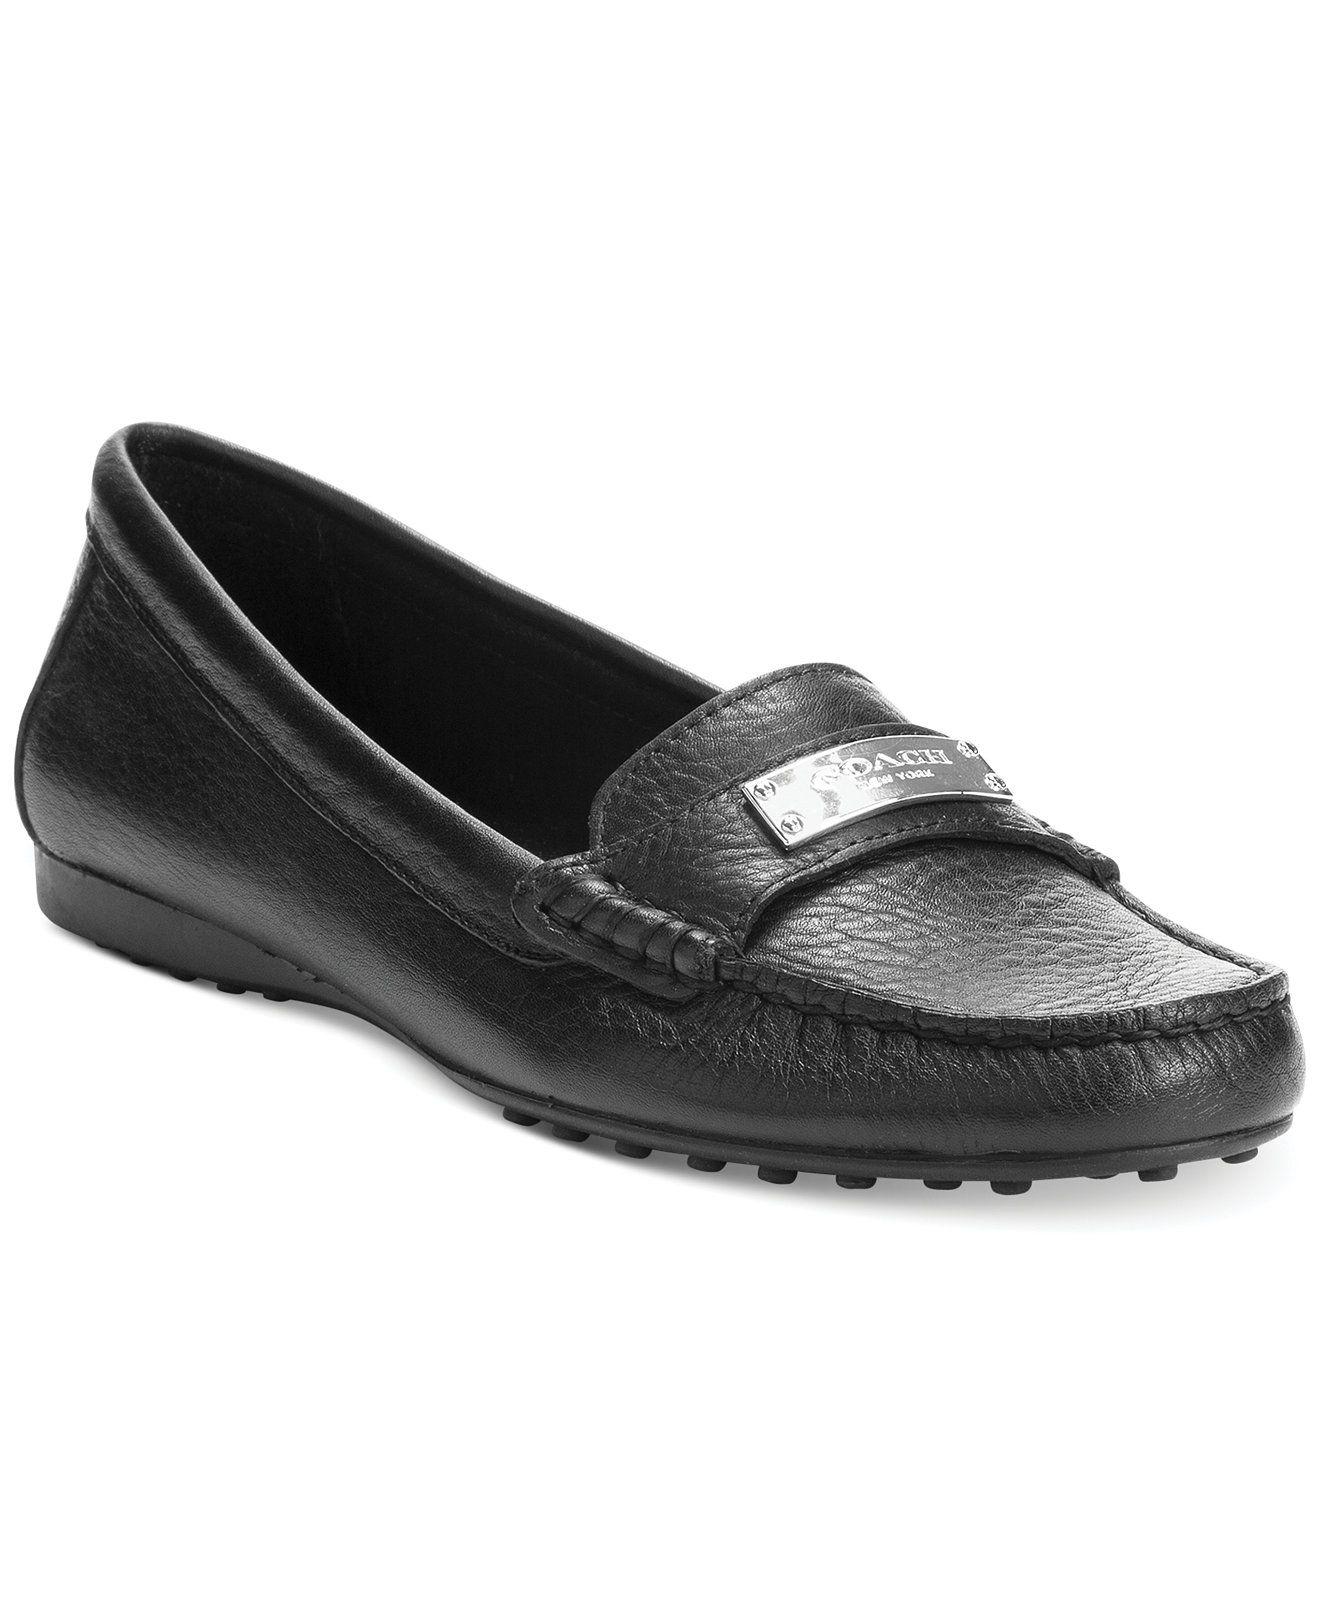 d05f1e1d1e9 COACH FREDRICA LOAFER FLATS - Shoes - Macy s